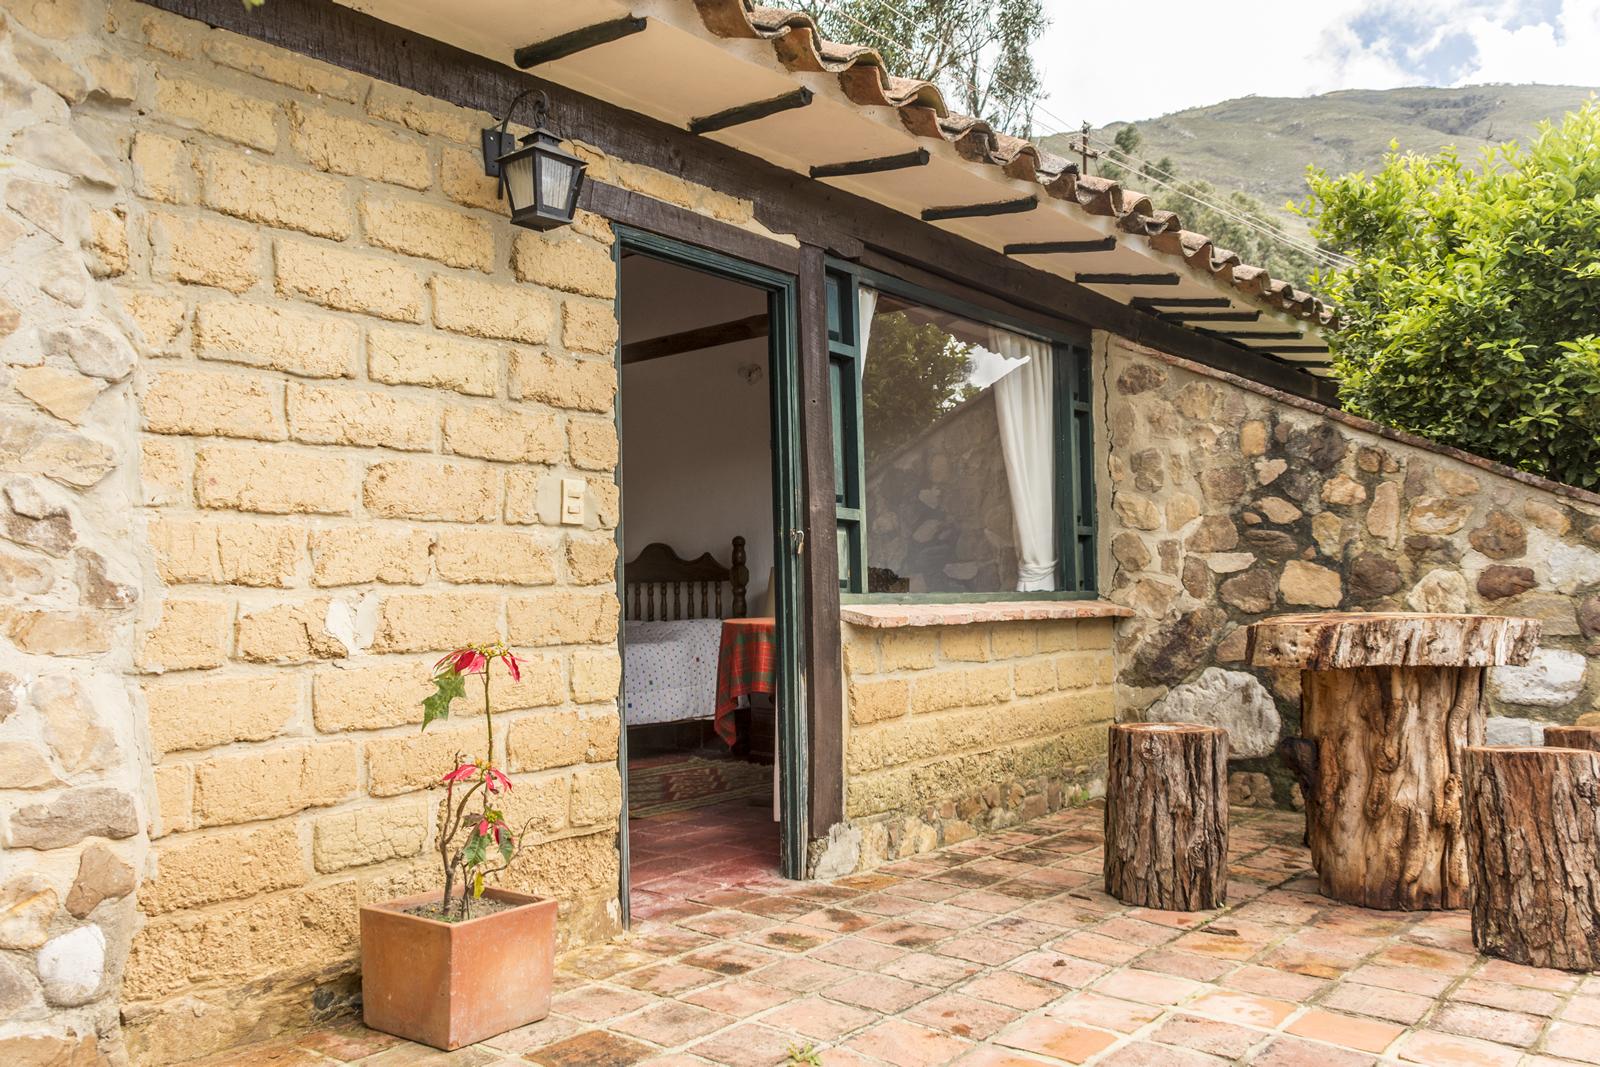 Alquiler casa Pozo Azul en Villa de Leyva - Entrada Habitación 4